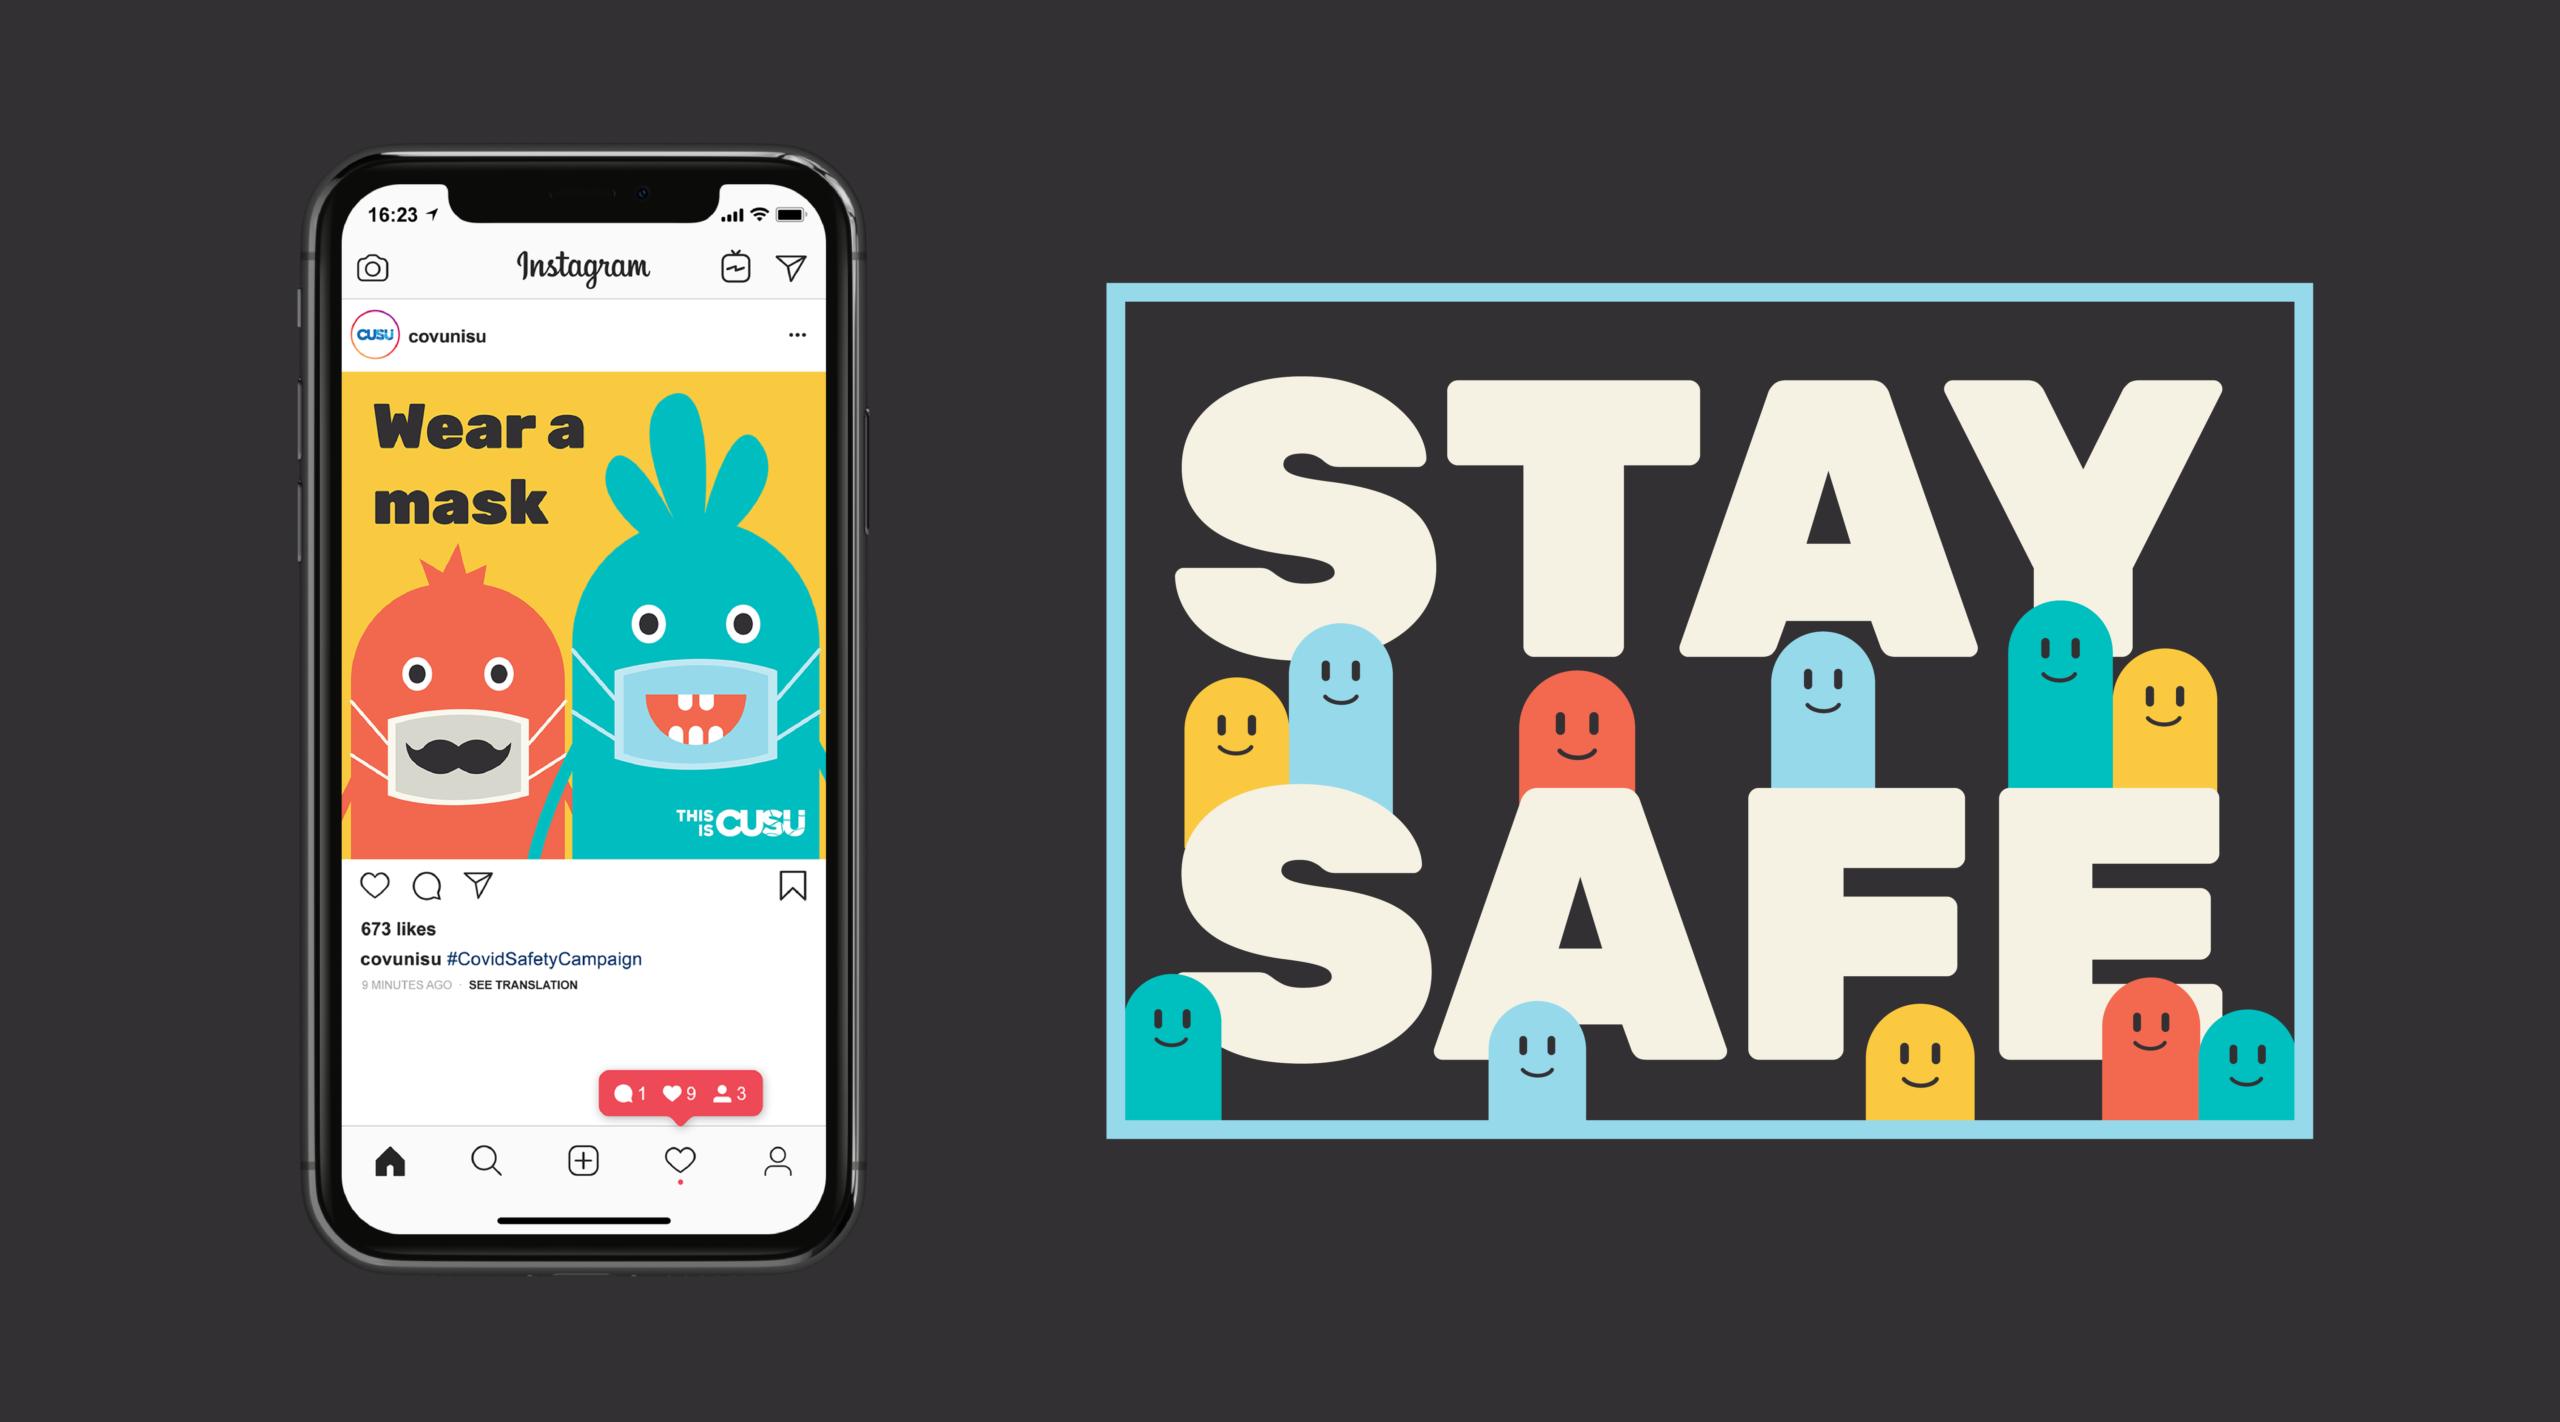 Covid Safety Campaign